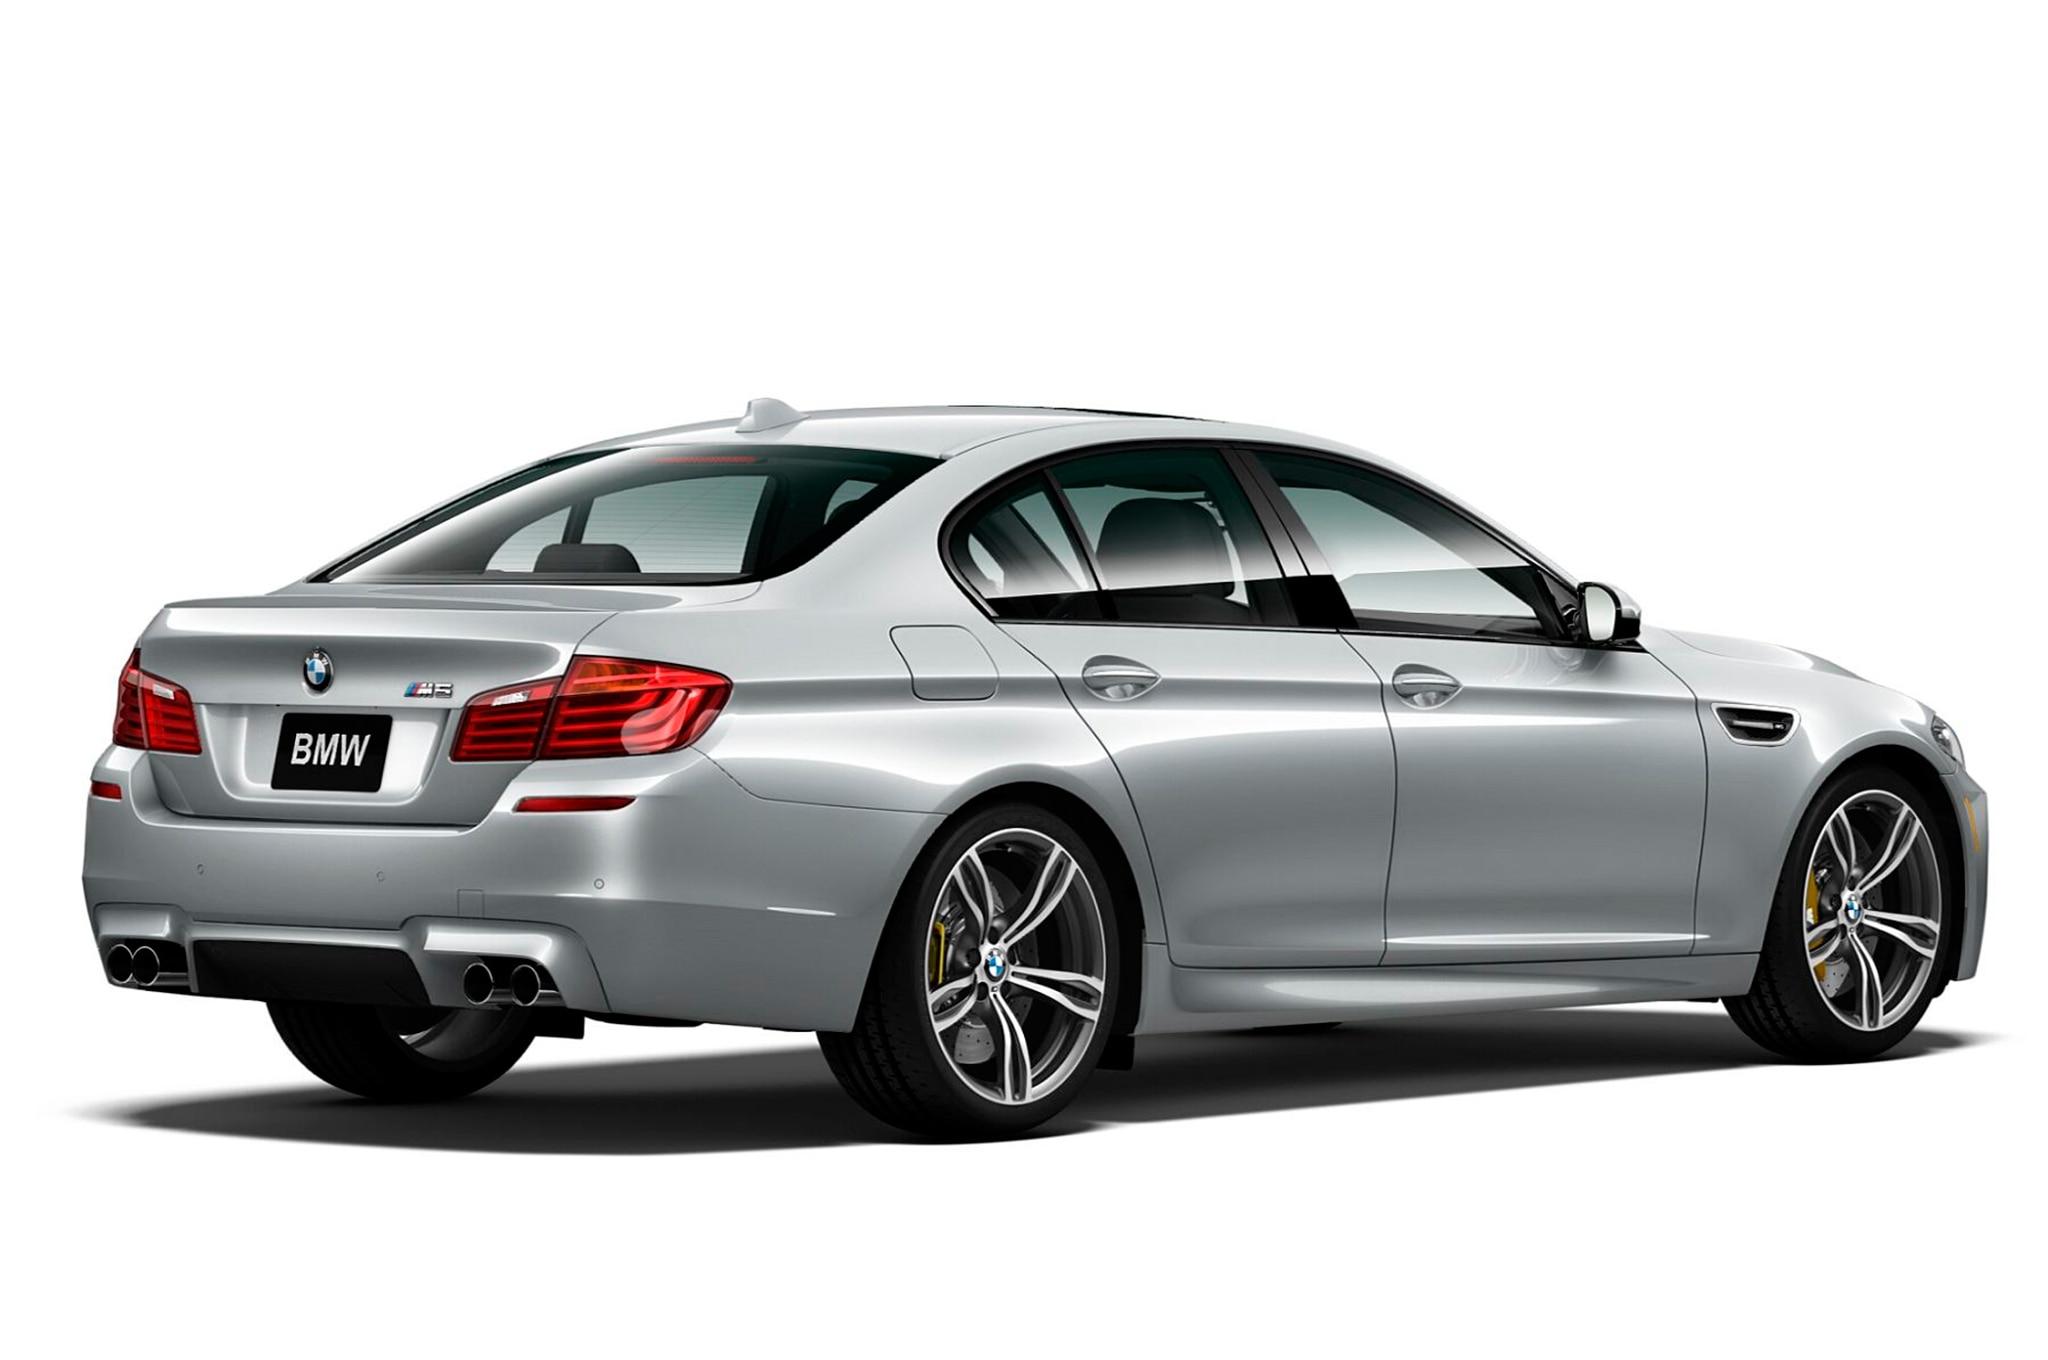 2016 BMW M5 Pure Metal Silver Limited Edition rear three quarter